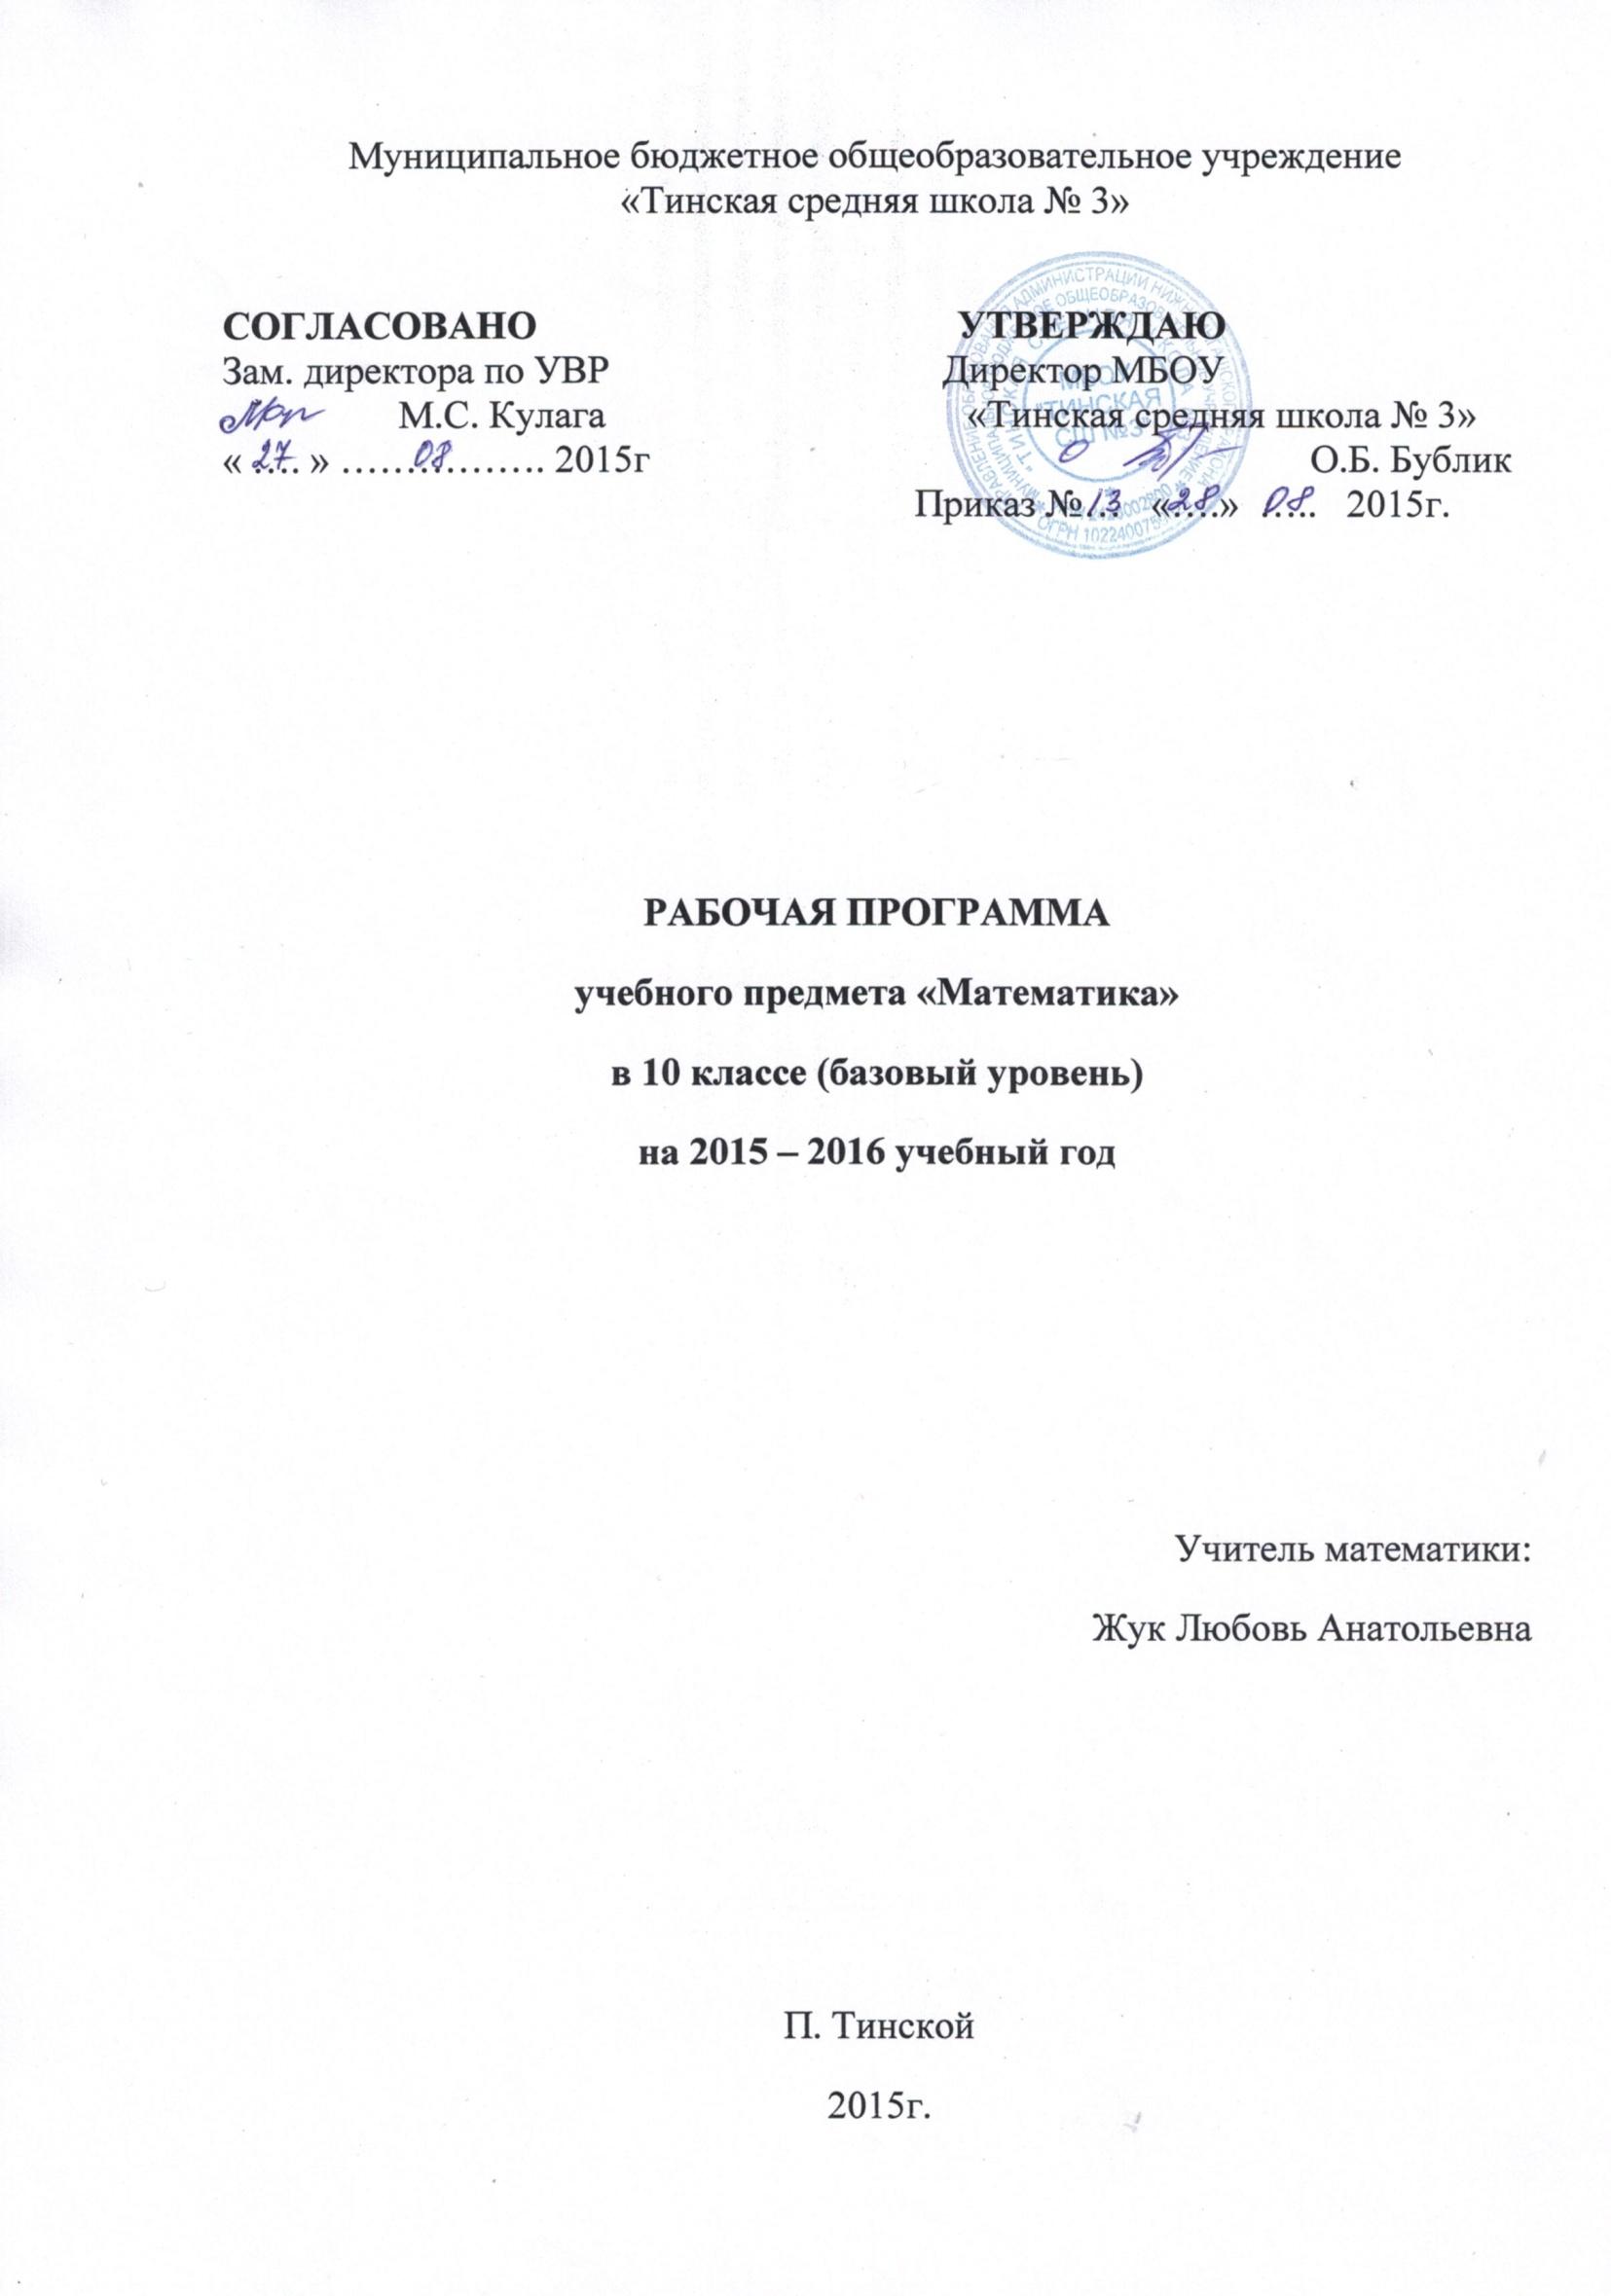 D:\Новая папка (2)\CCI12102015_0003.JPG